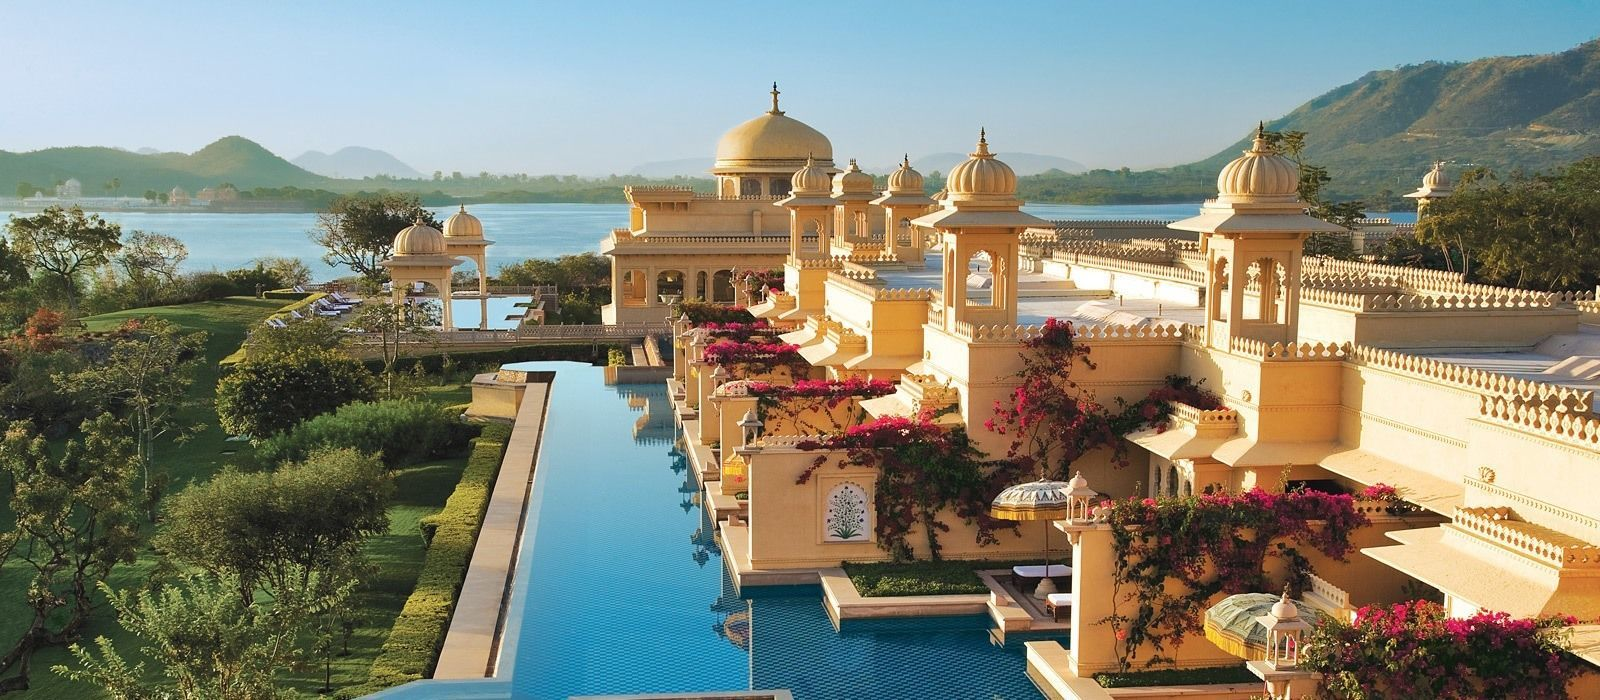 The Oberoi Hotels & Resorts Sommerangebot: Royales Rajasthan Urlaub 3